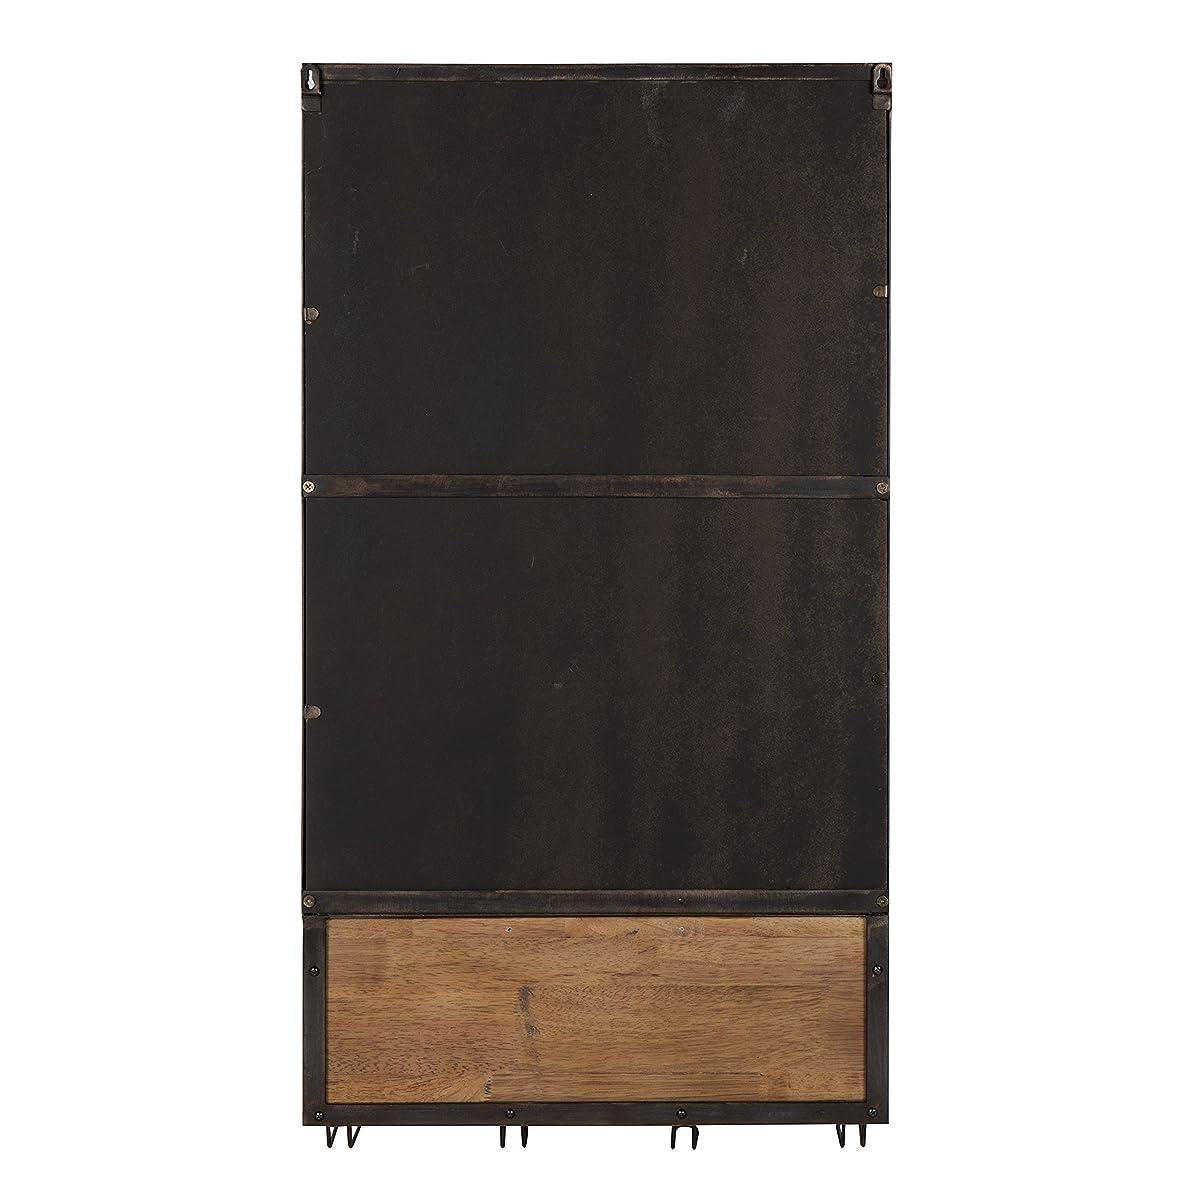 Kate and Laurel Coburn Distressed Metal Mirror with Wood Shelf and Hooks, Black